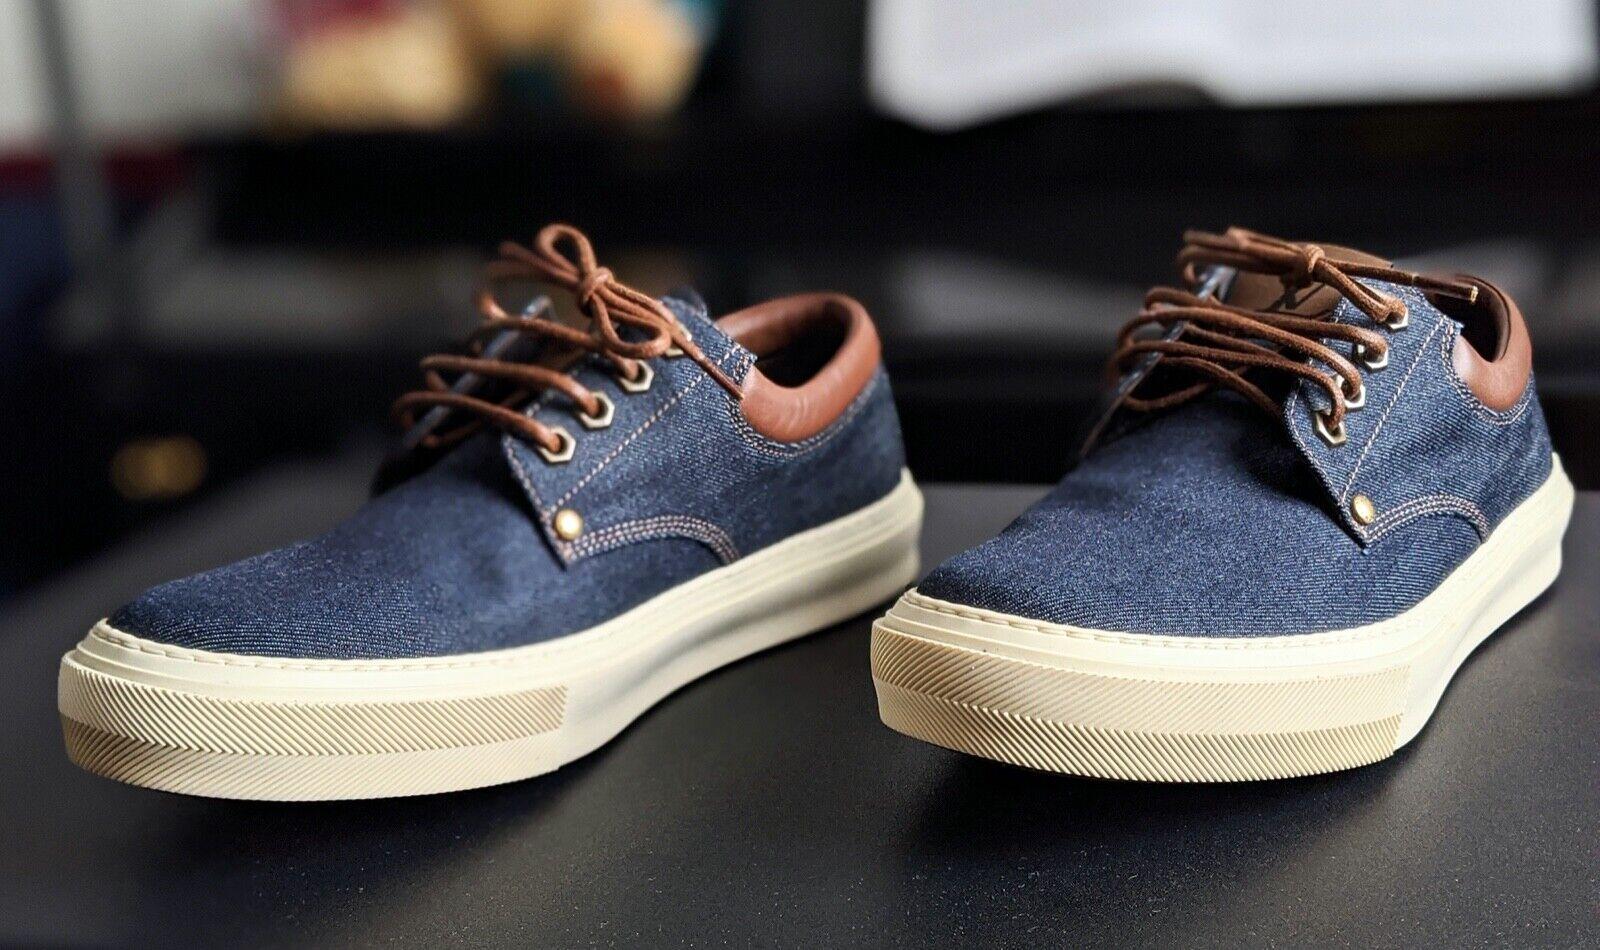 Louis vuitton sneakers goncourt derby